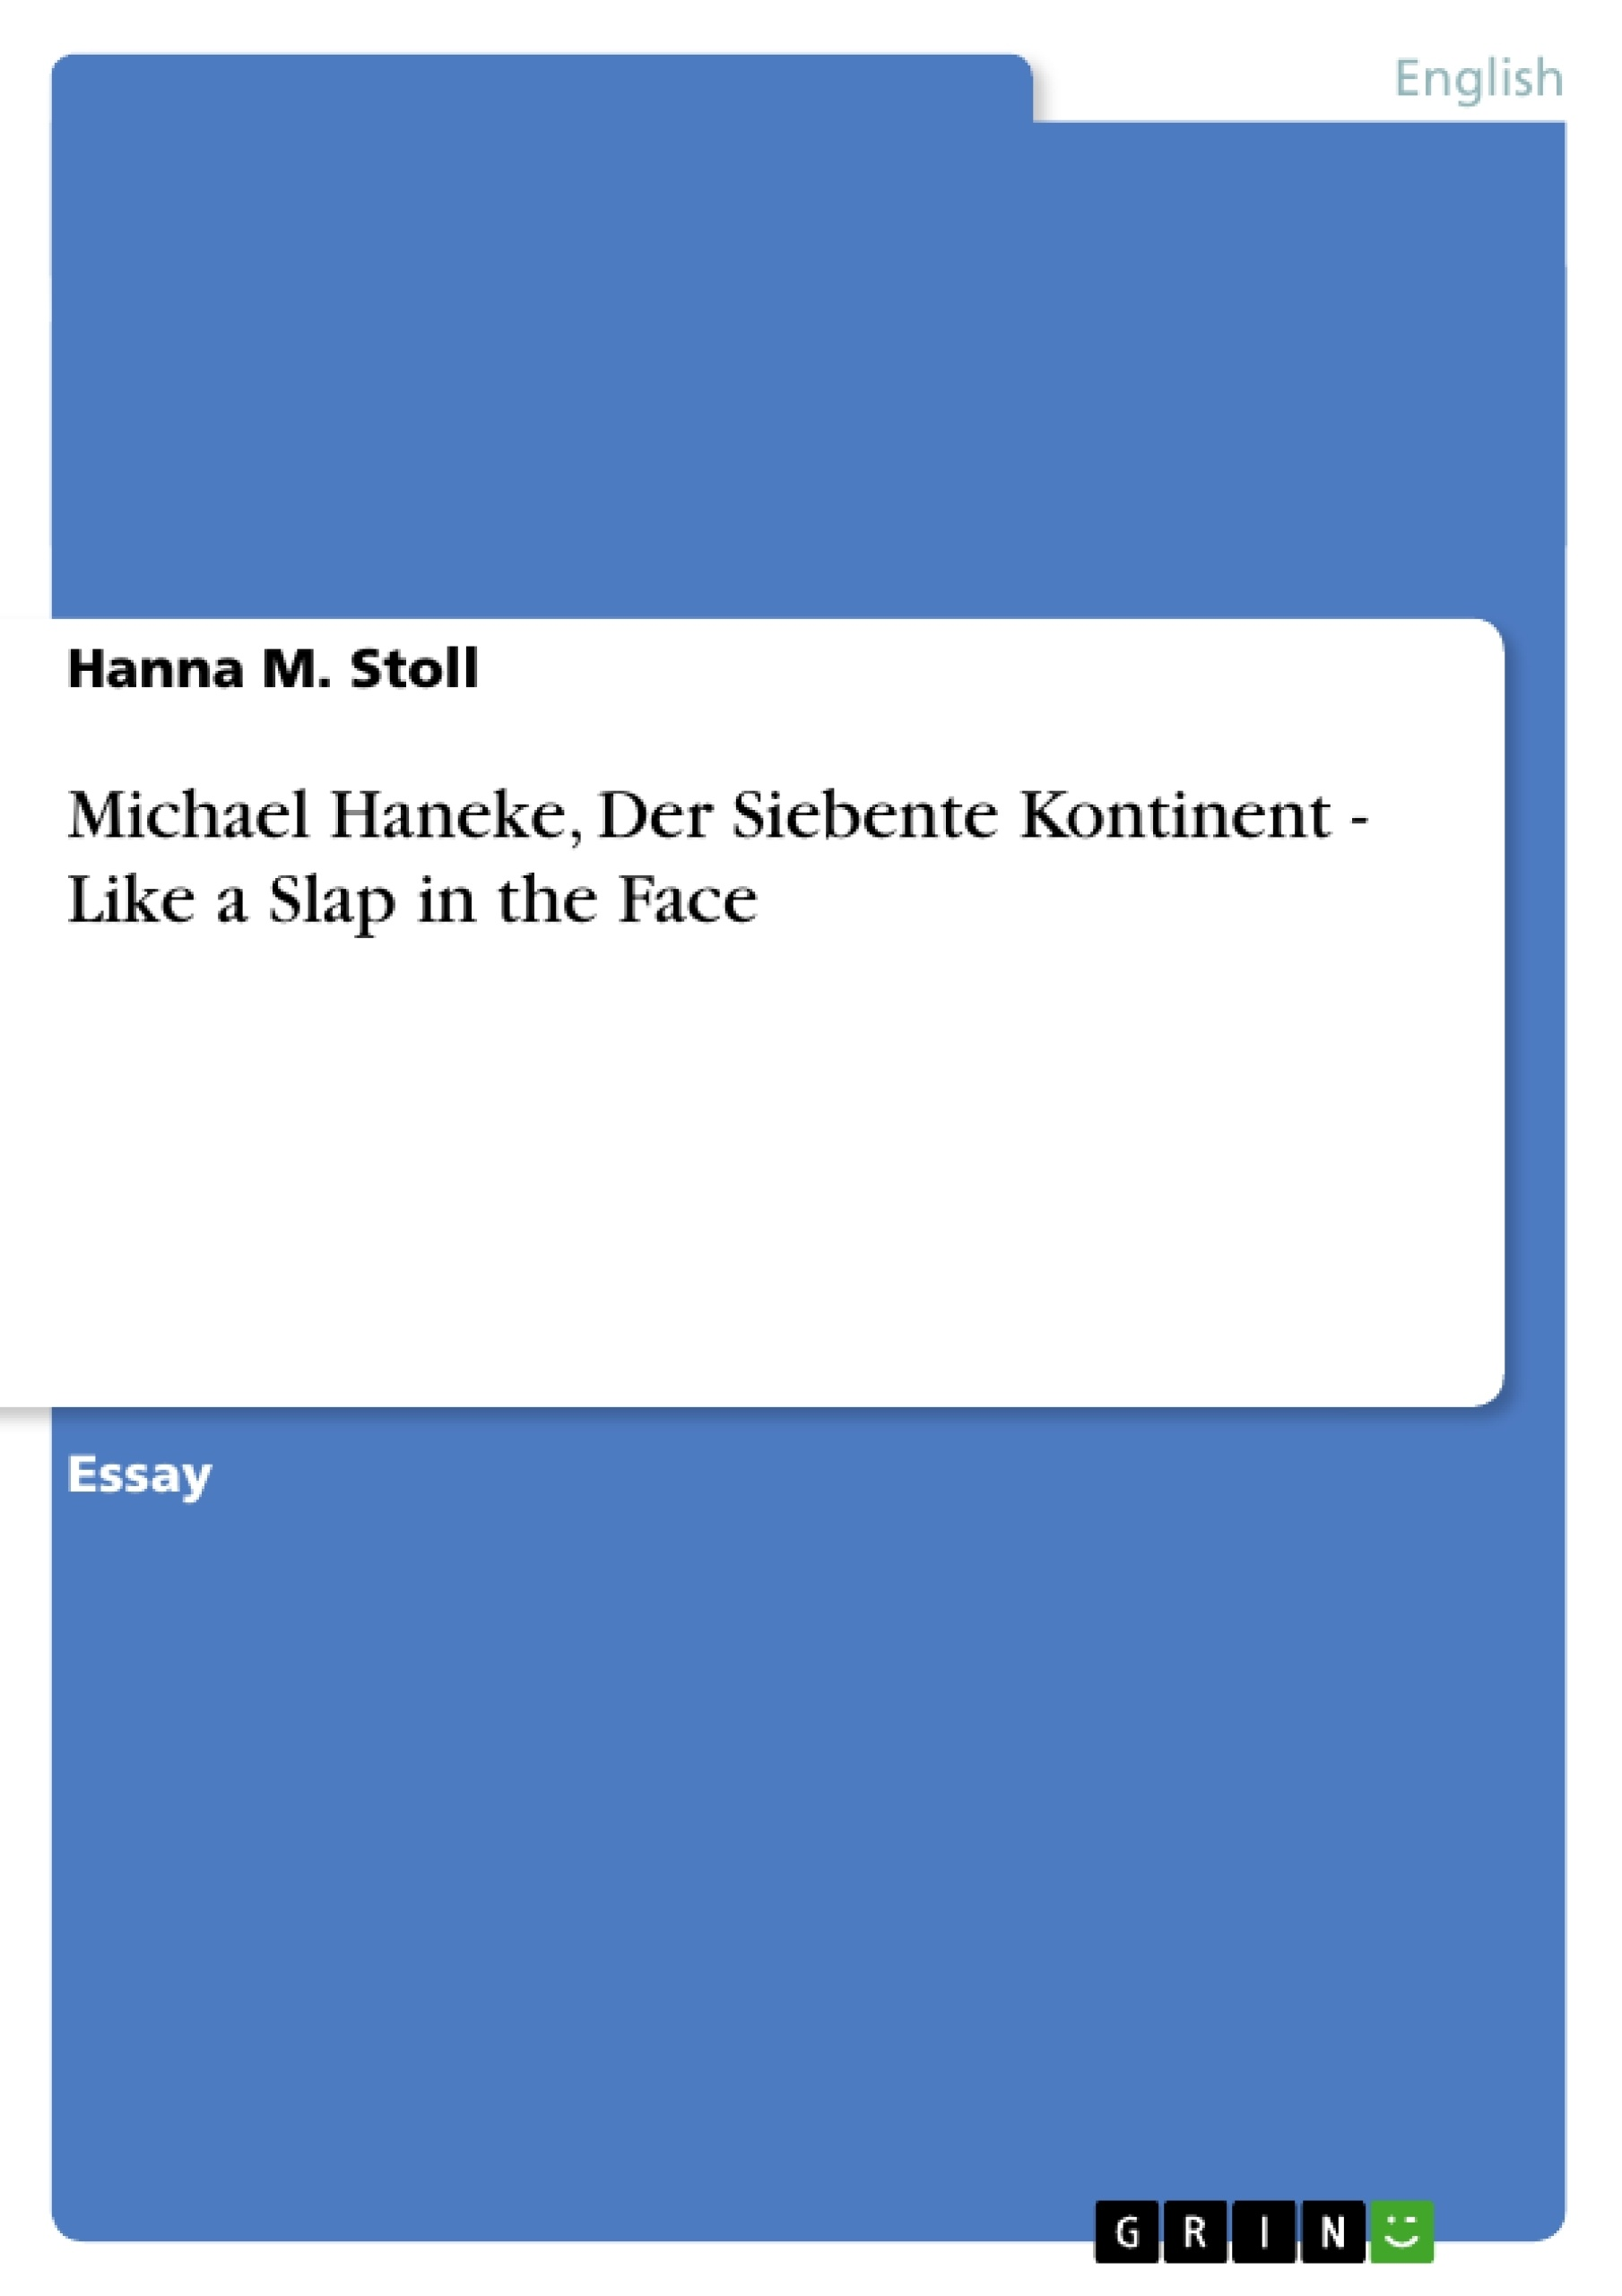 Title: Michael Haneke, Der Siebente Kontinent - Like a Slap in the Face